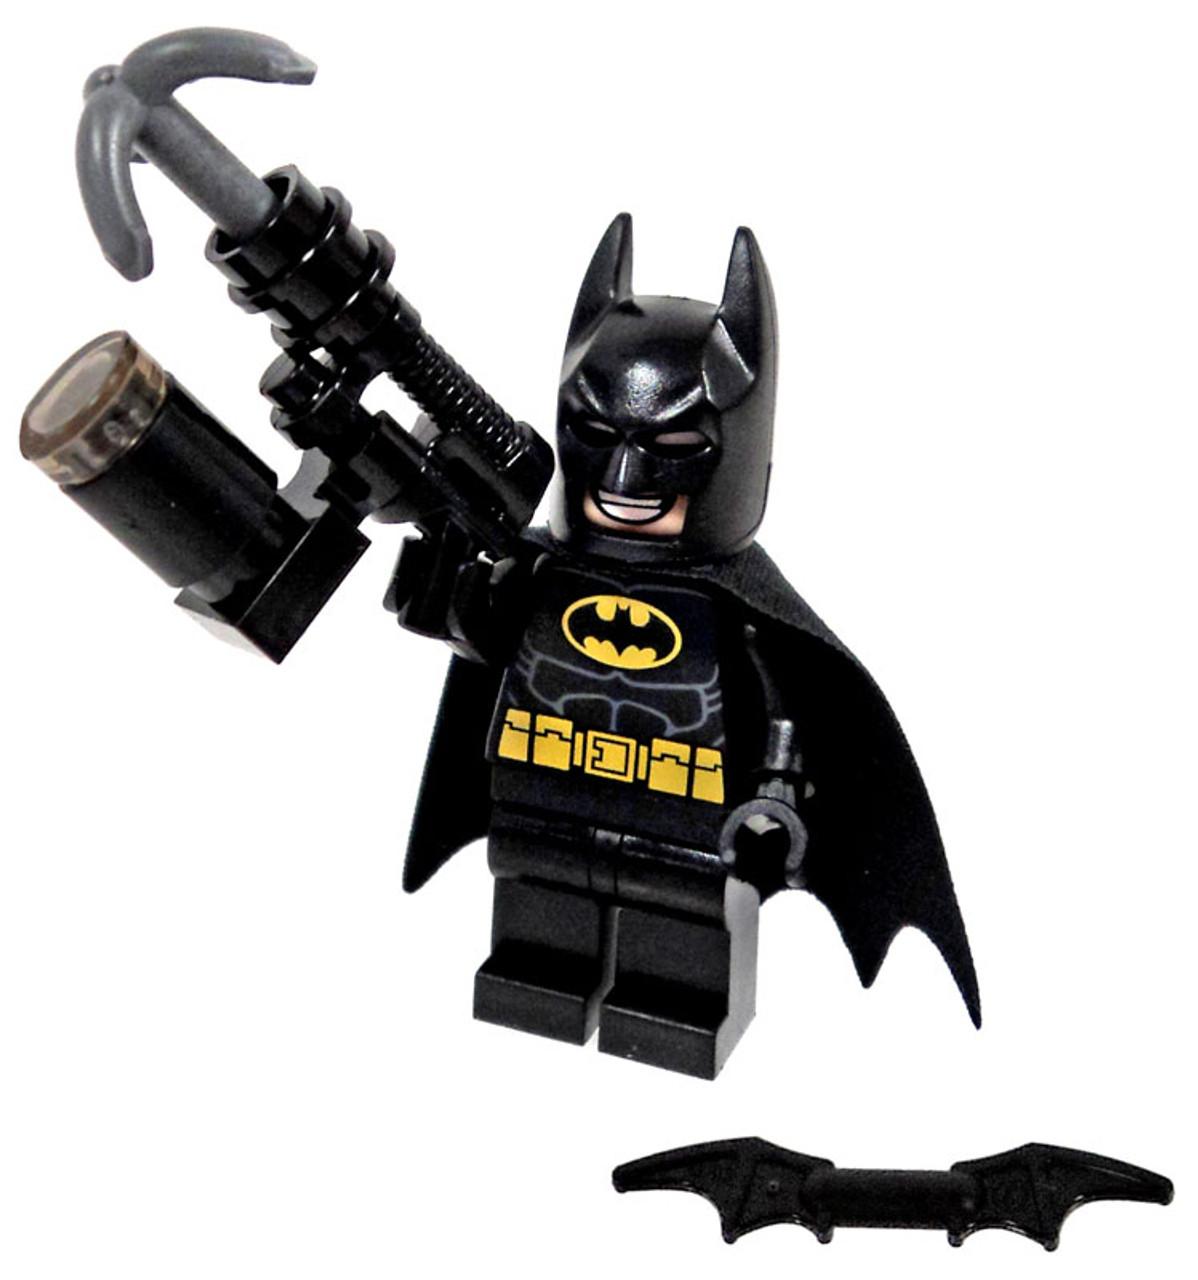 Minifig Weapon LEGO Black Grapple Hook Gun Batman